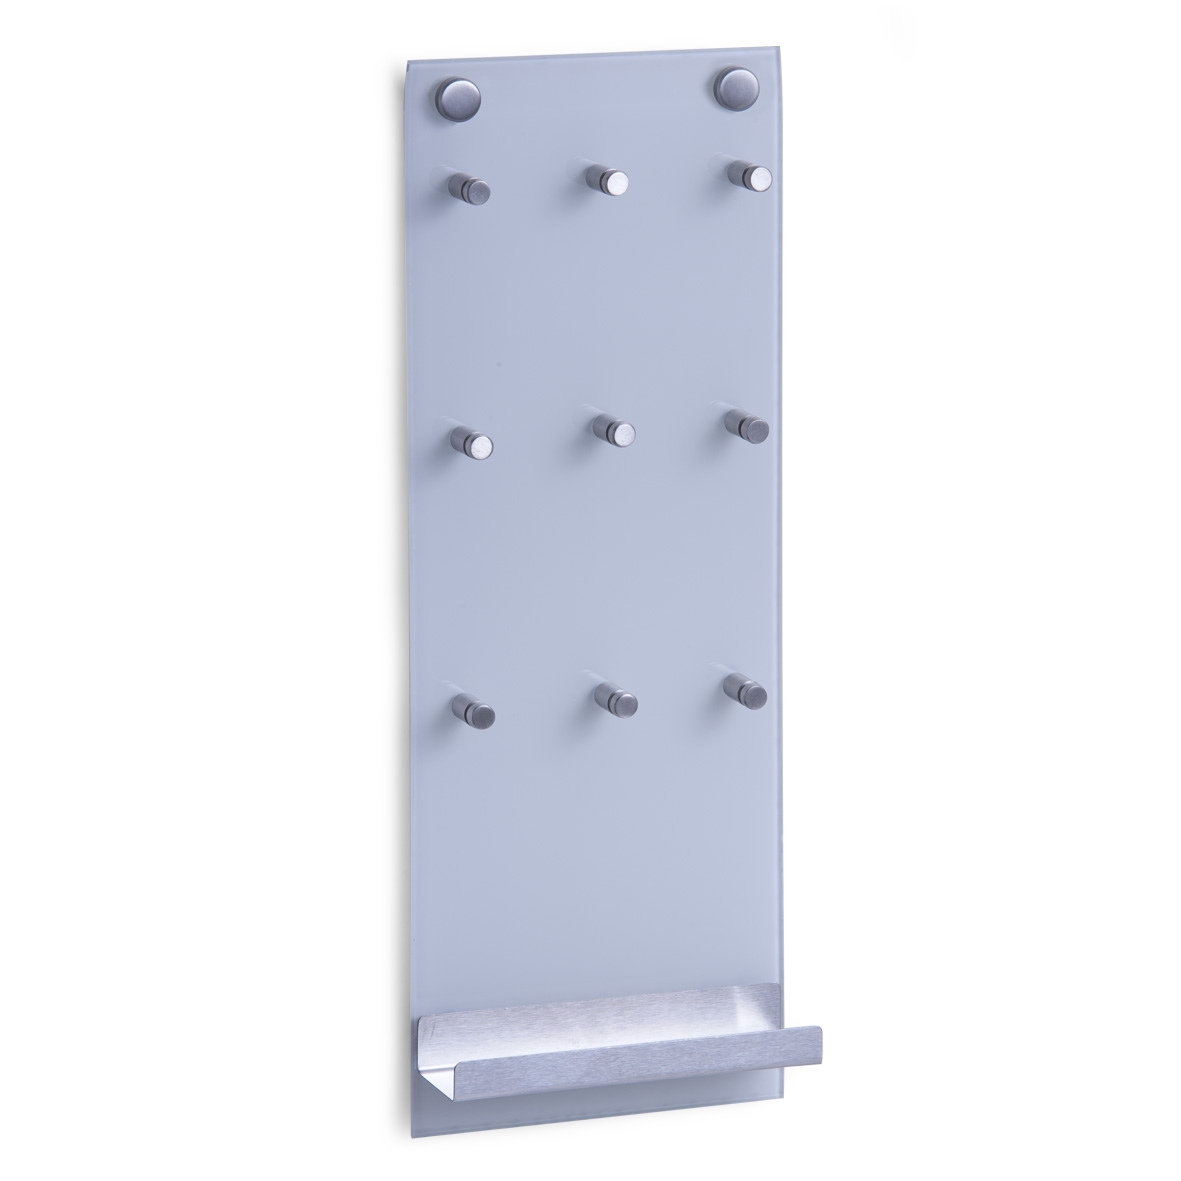 Suport pentru chei, Satin Glass, l15xH40 cm